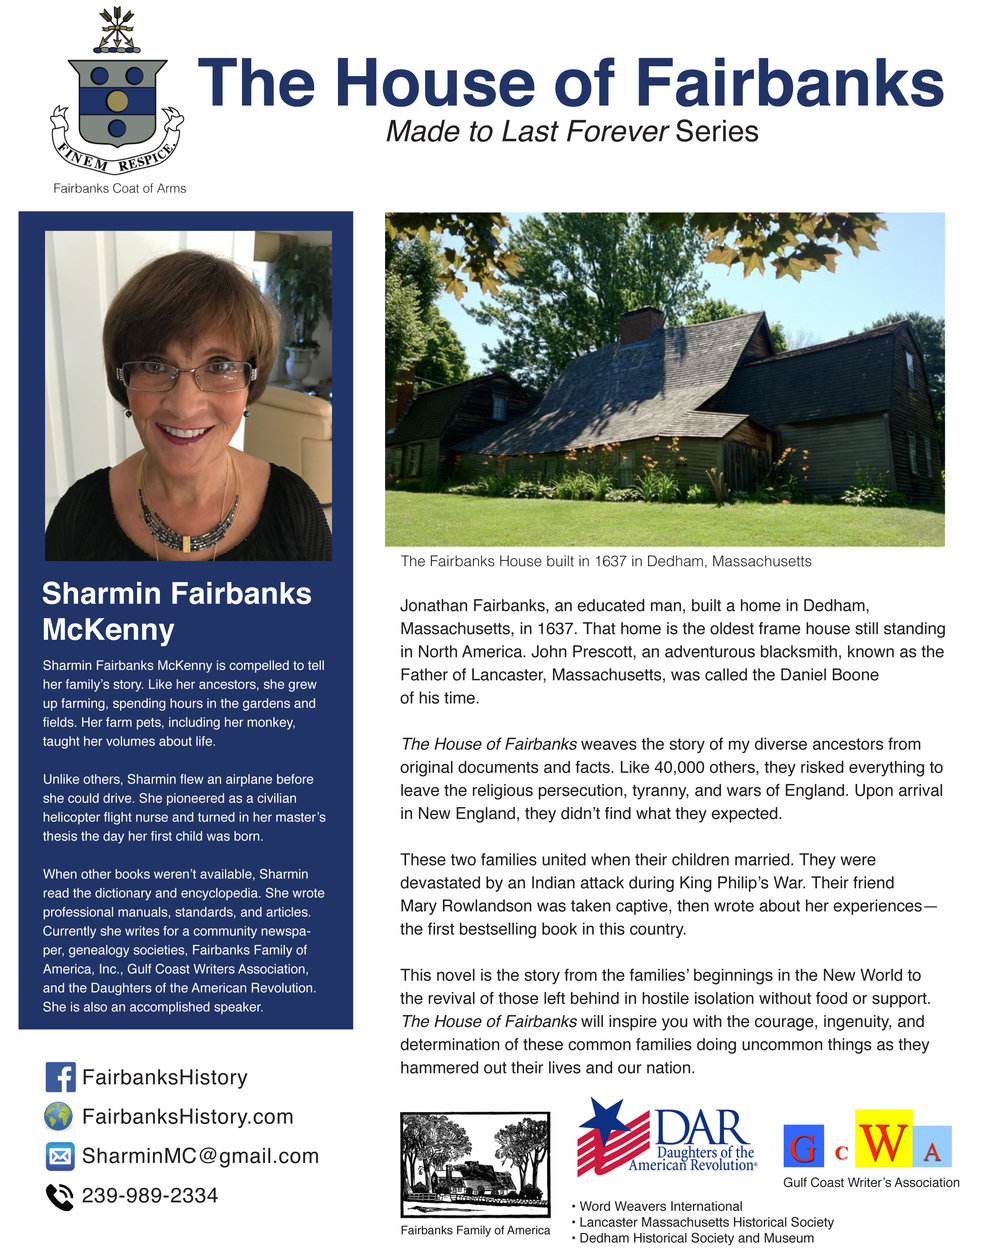 FairbankHistory Sharmin Fairbanks McKenny One Page